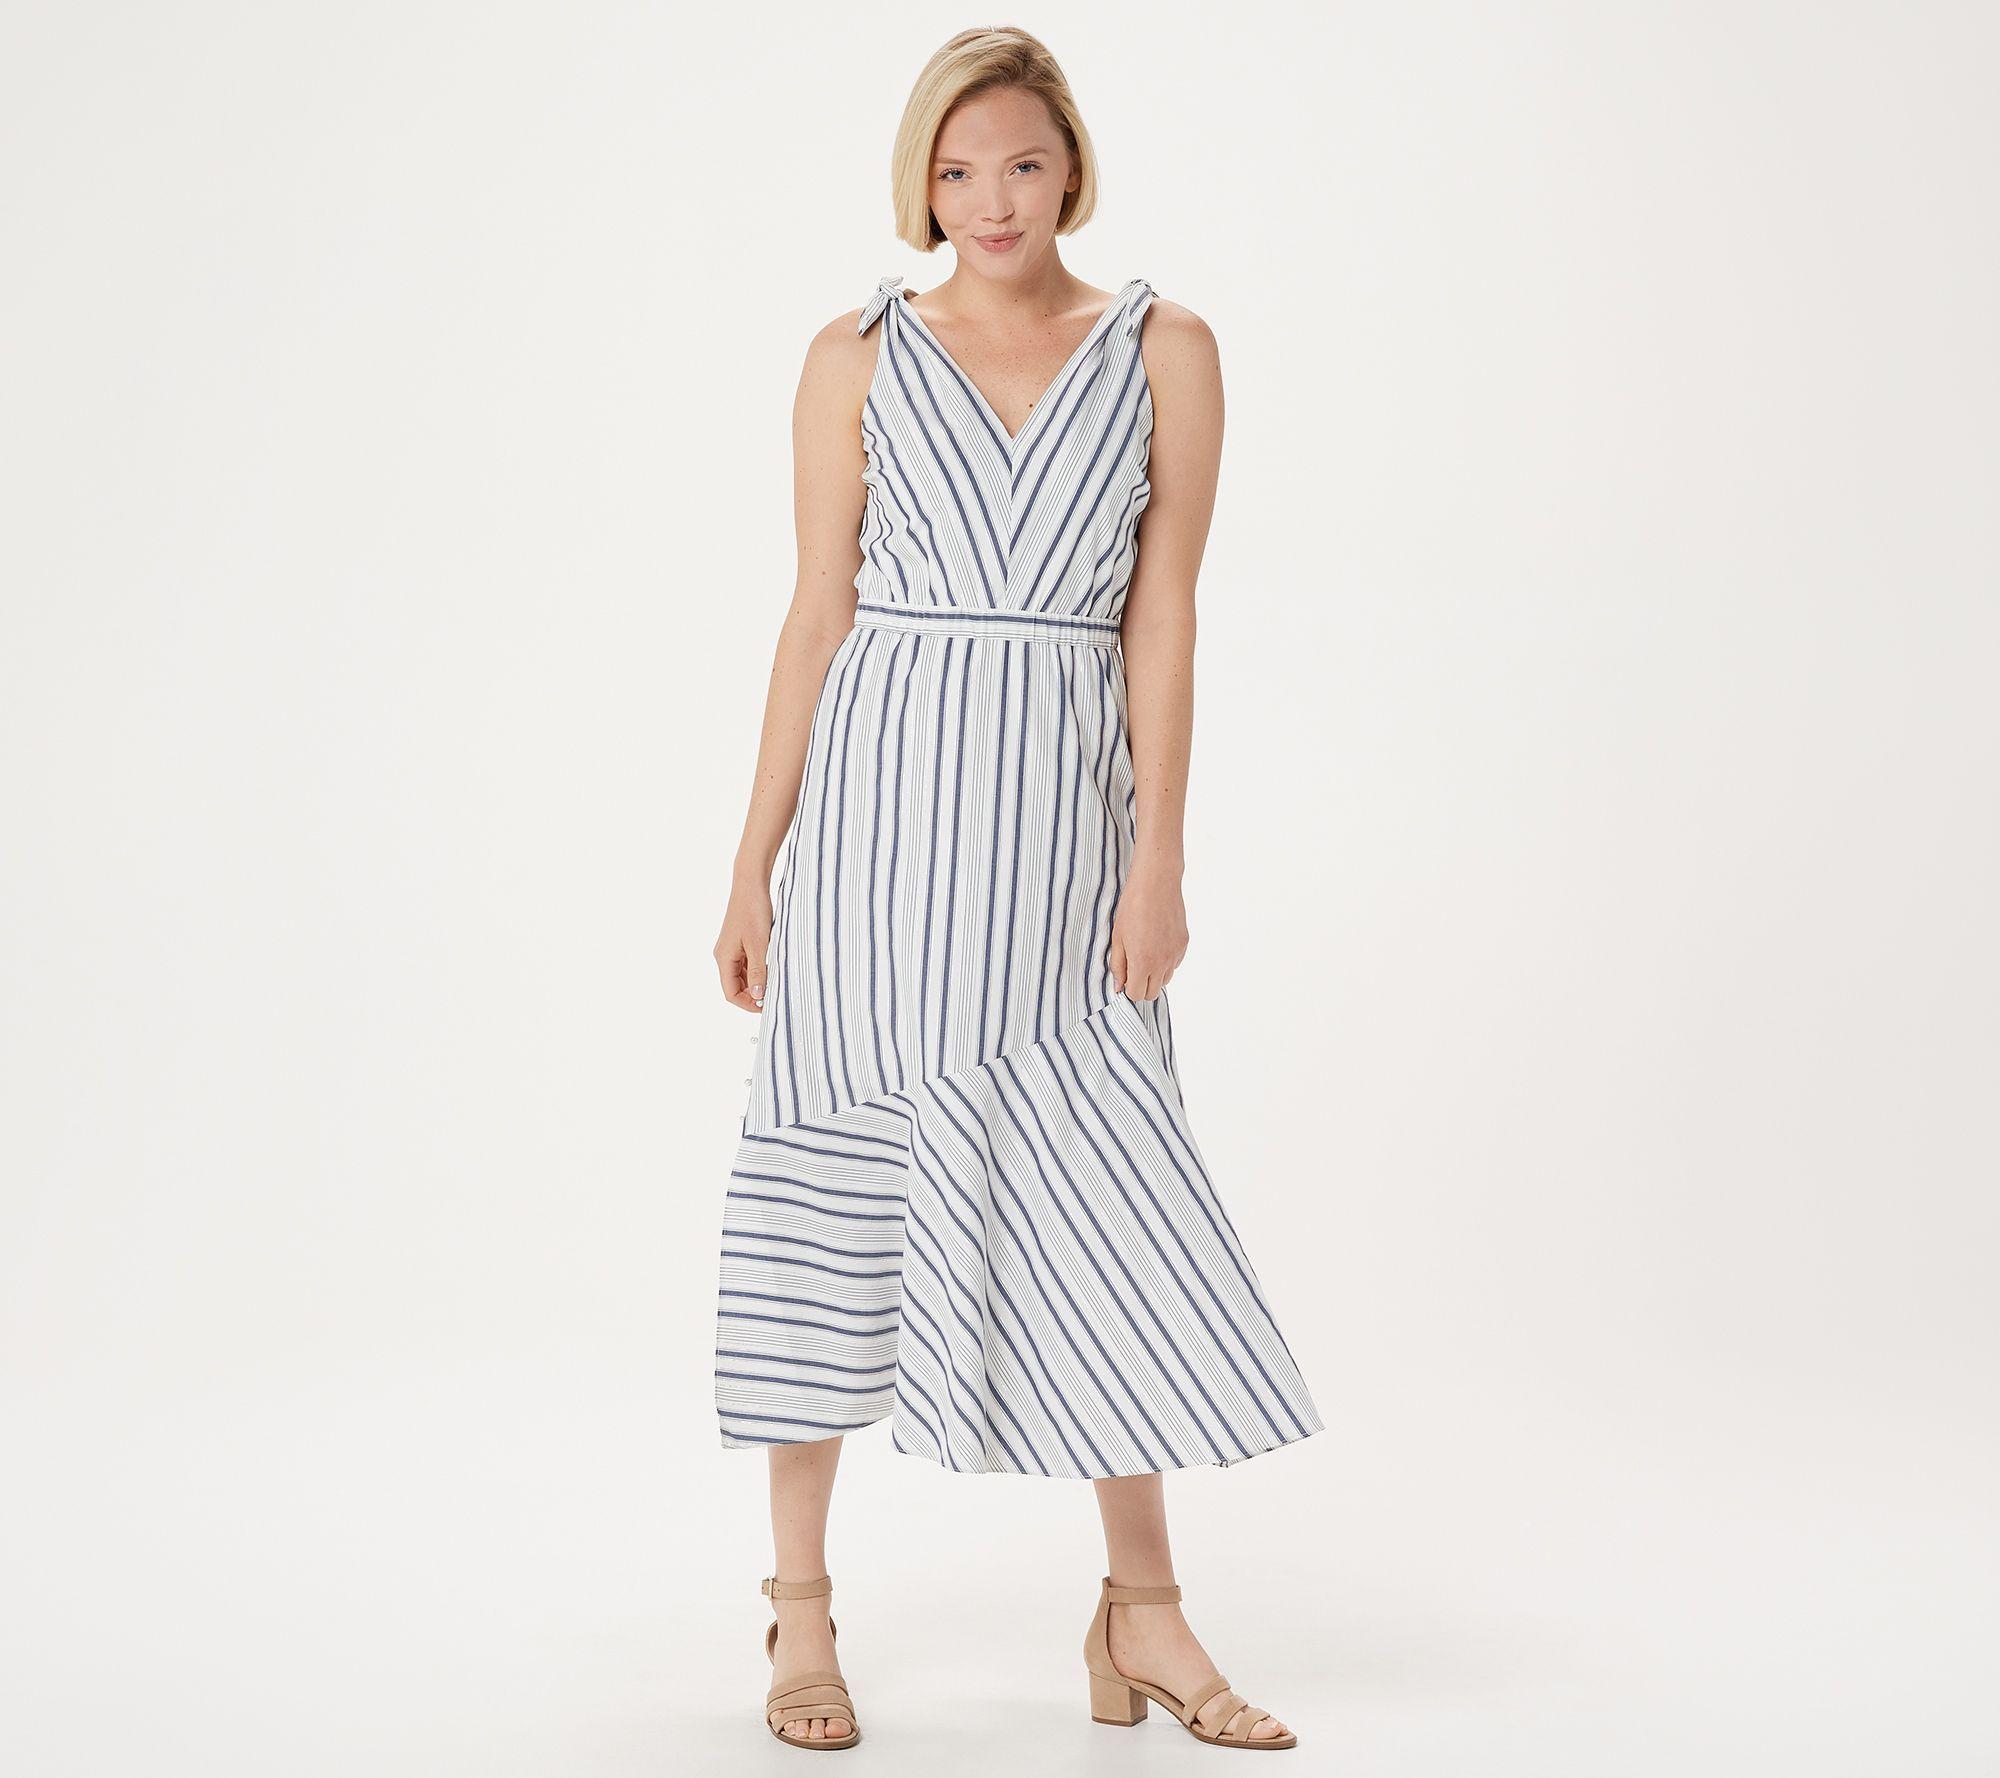 Sam Edelman Striped Maxi Dress Qvc Com Striped Maxi Dresses Dresses White Maxi Dresses [ 1778 x 2000 Pixel ]